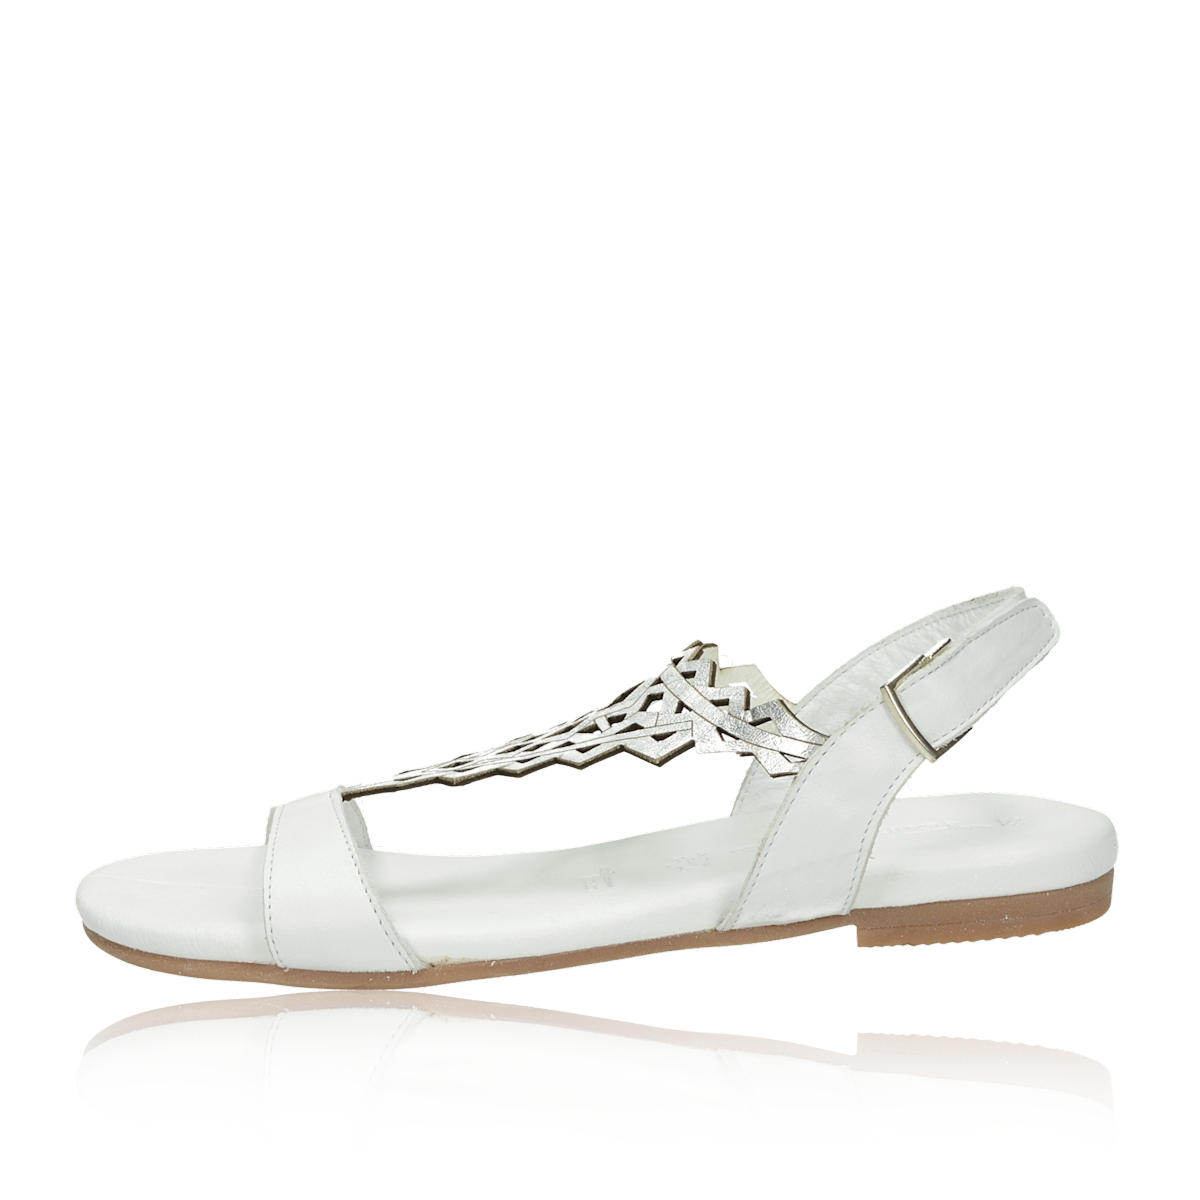 cbab4a91c340 ... Tamaris dámské elegantní sandály na suchý zip - bílé ...